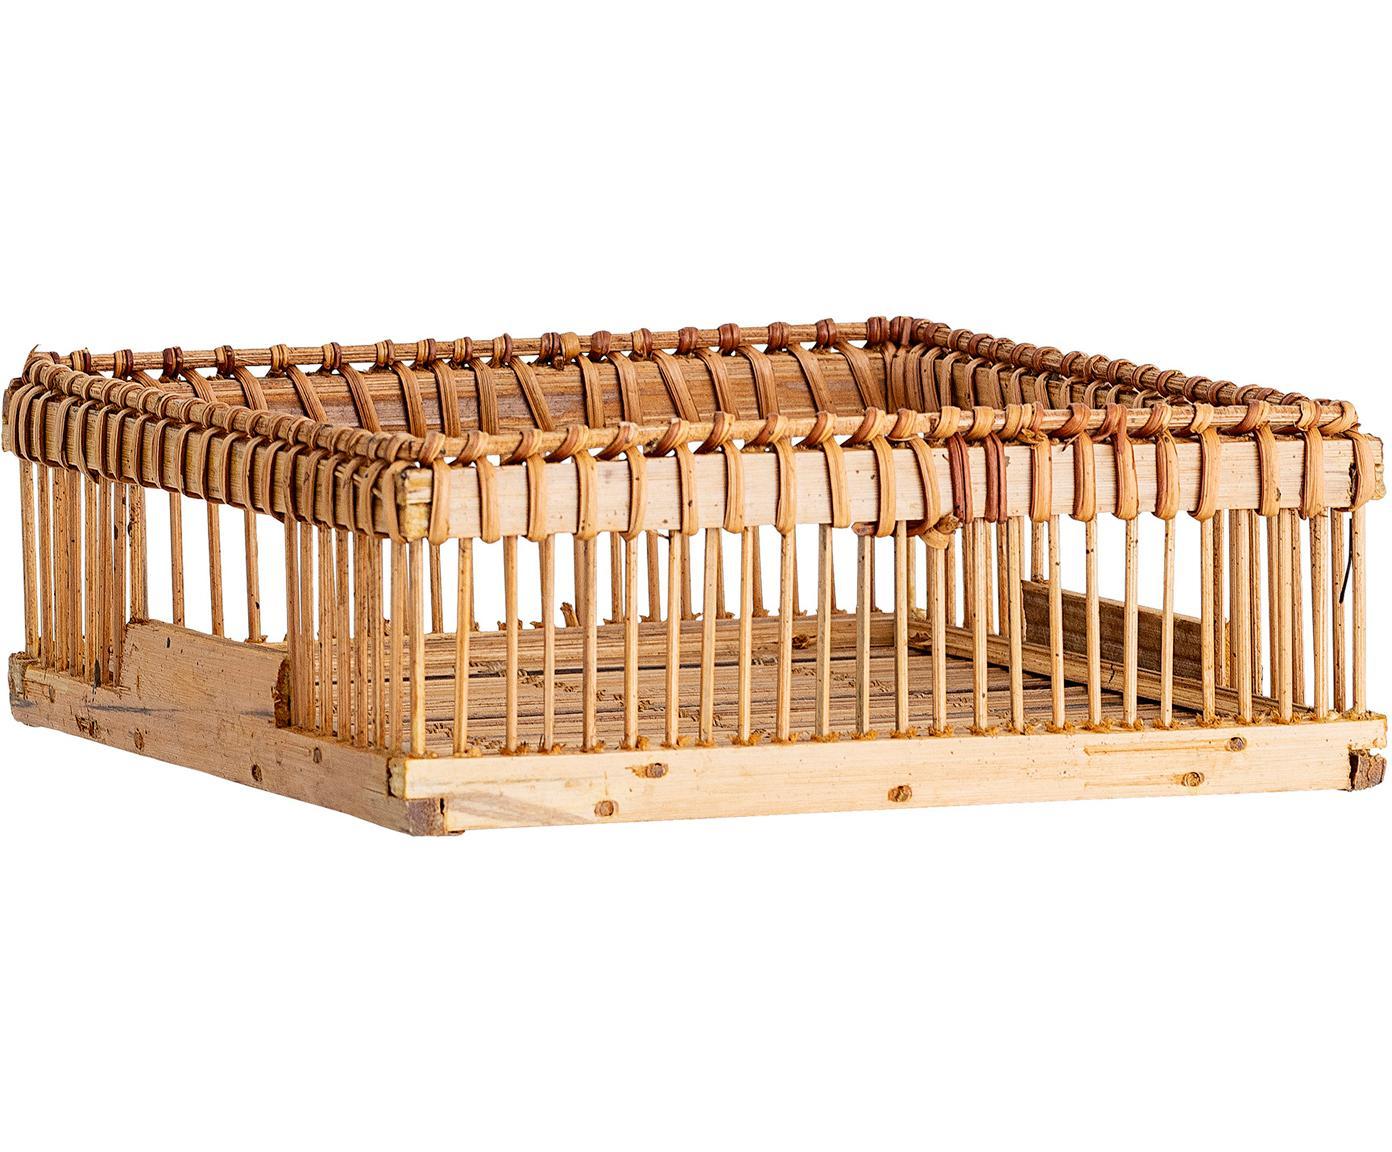 Servettenhouder Lamgo, Bamboehout, Bamboehoutkleurig, B 18 x D 18 cm